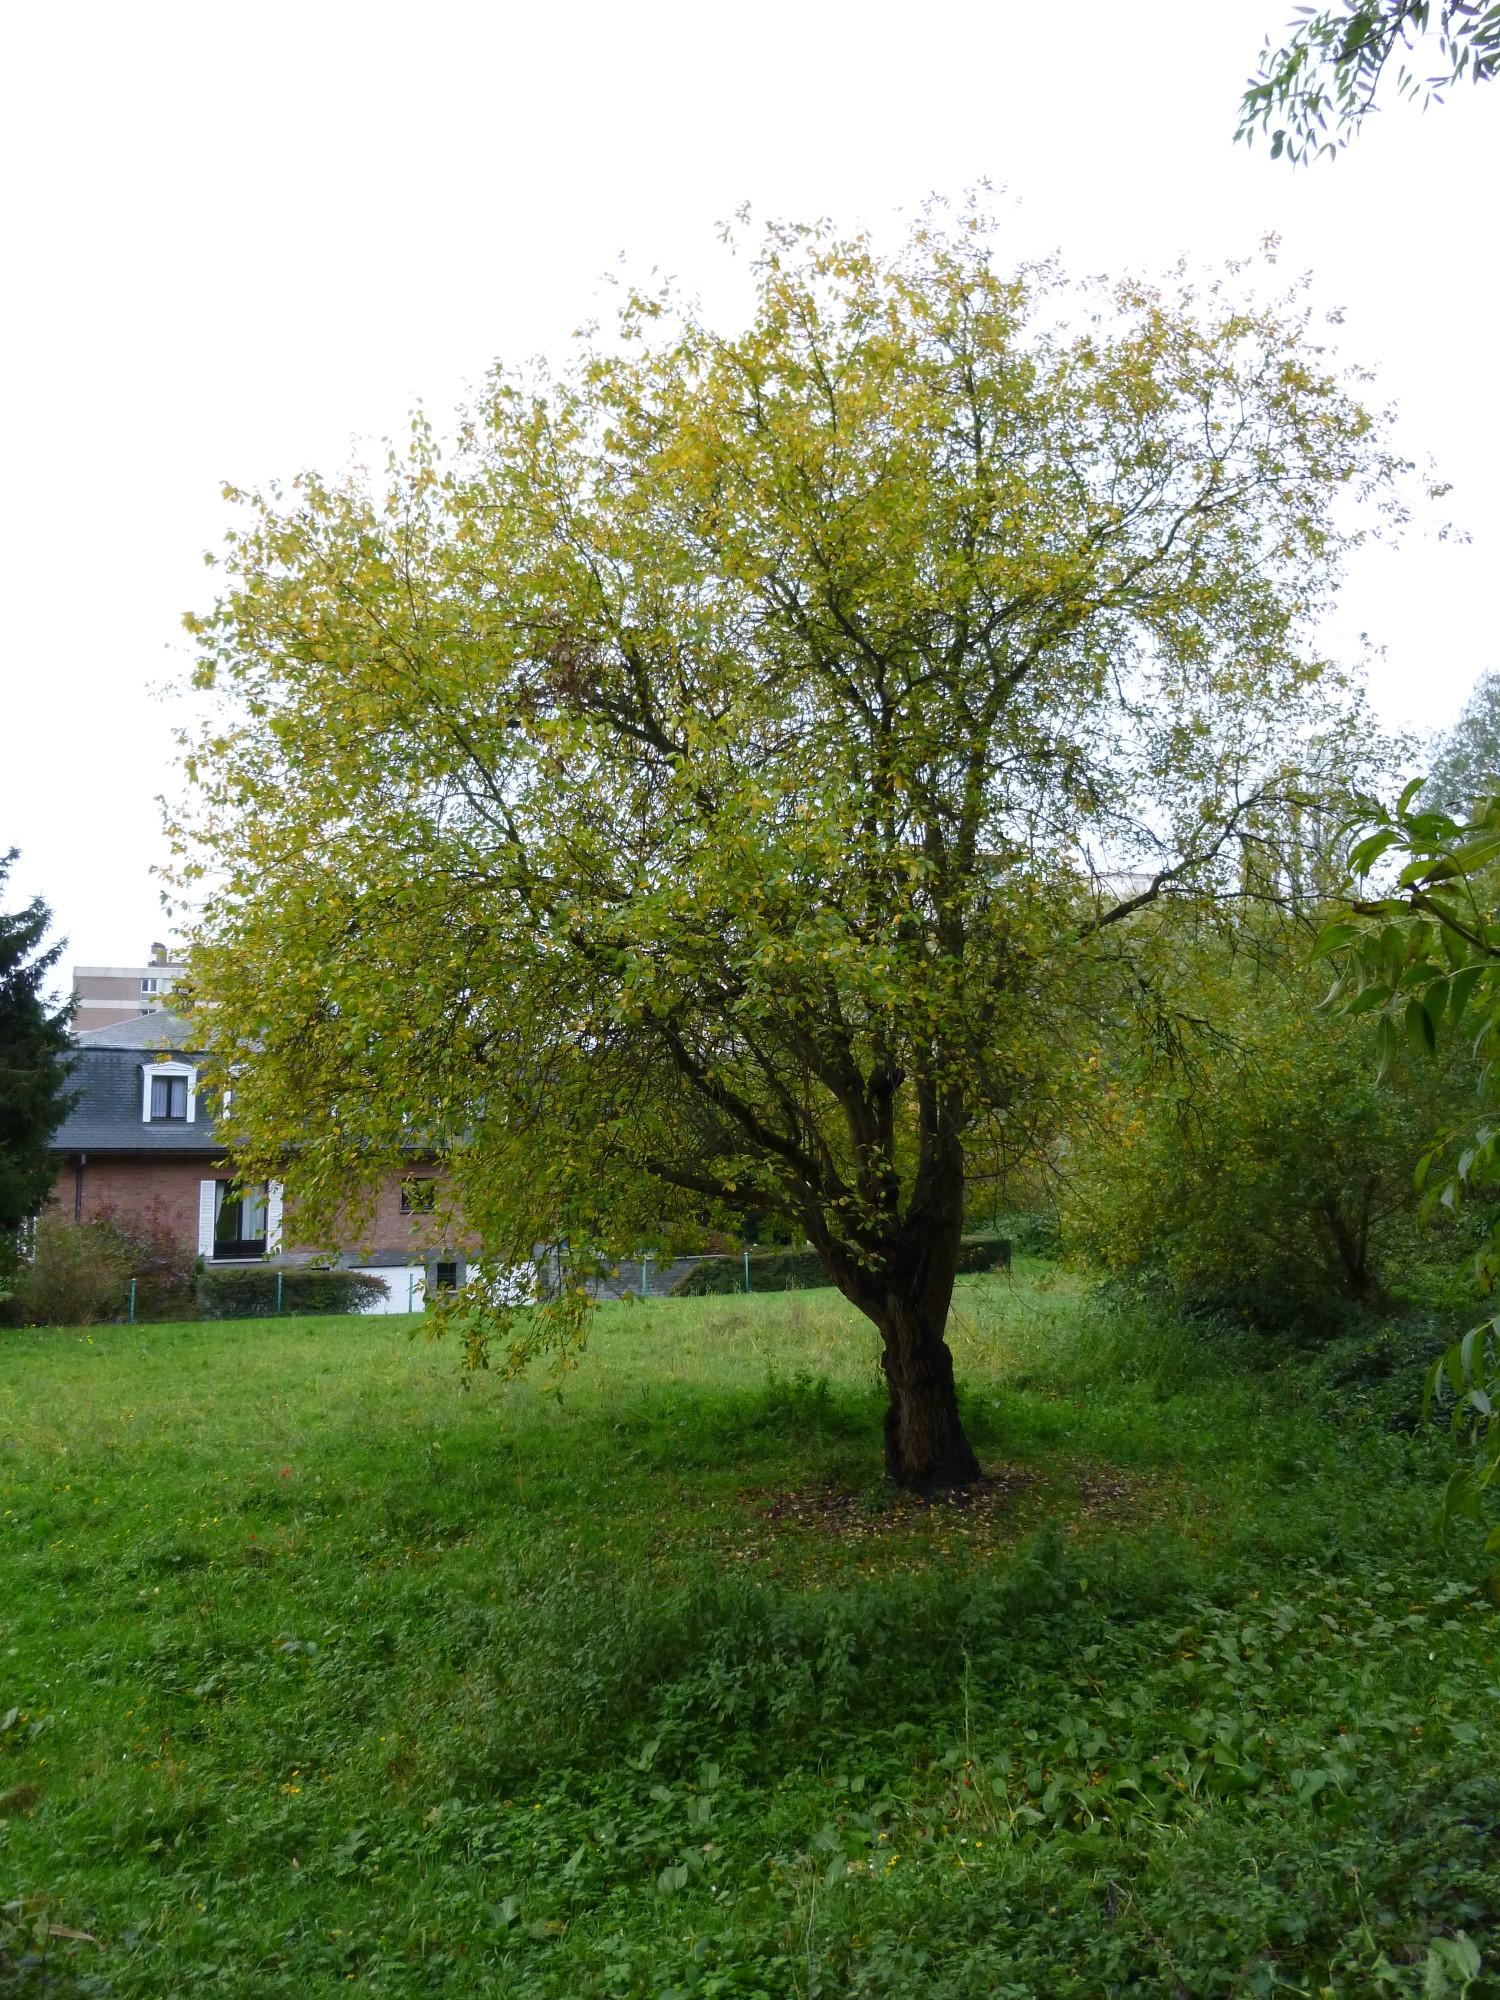 salix caprea saule marsault inventaire des arbres remarquables r gion de bruxelles capitale. Black Bedroom Furniture Sets. Home Design Ideas